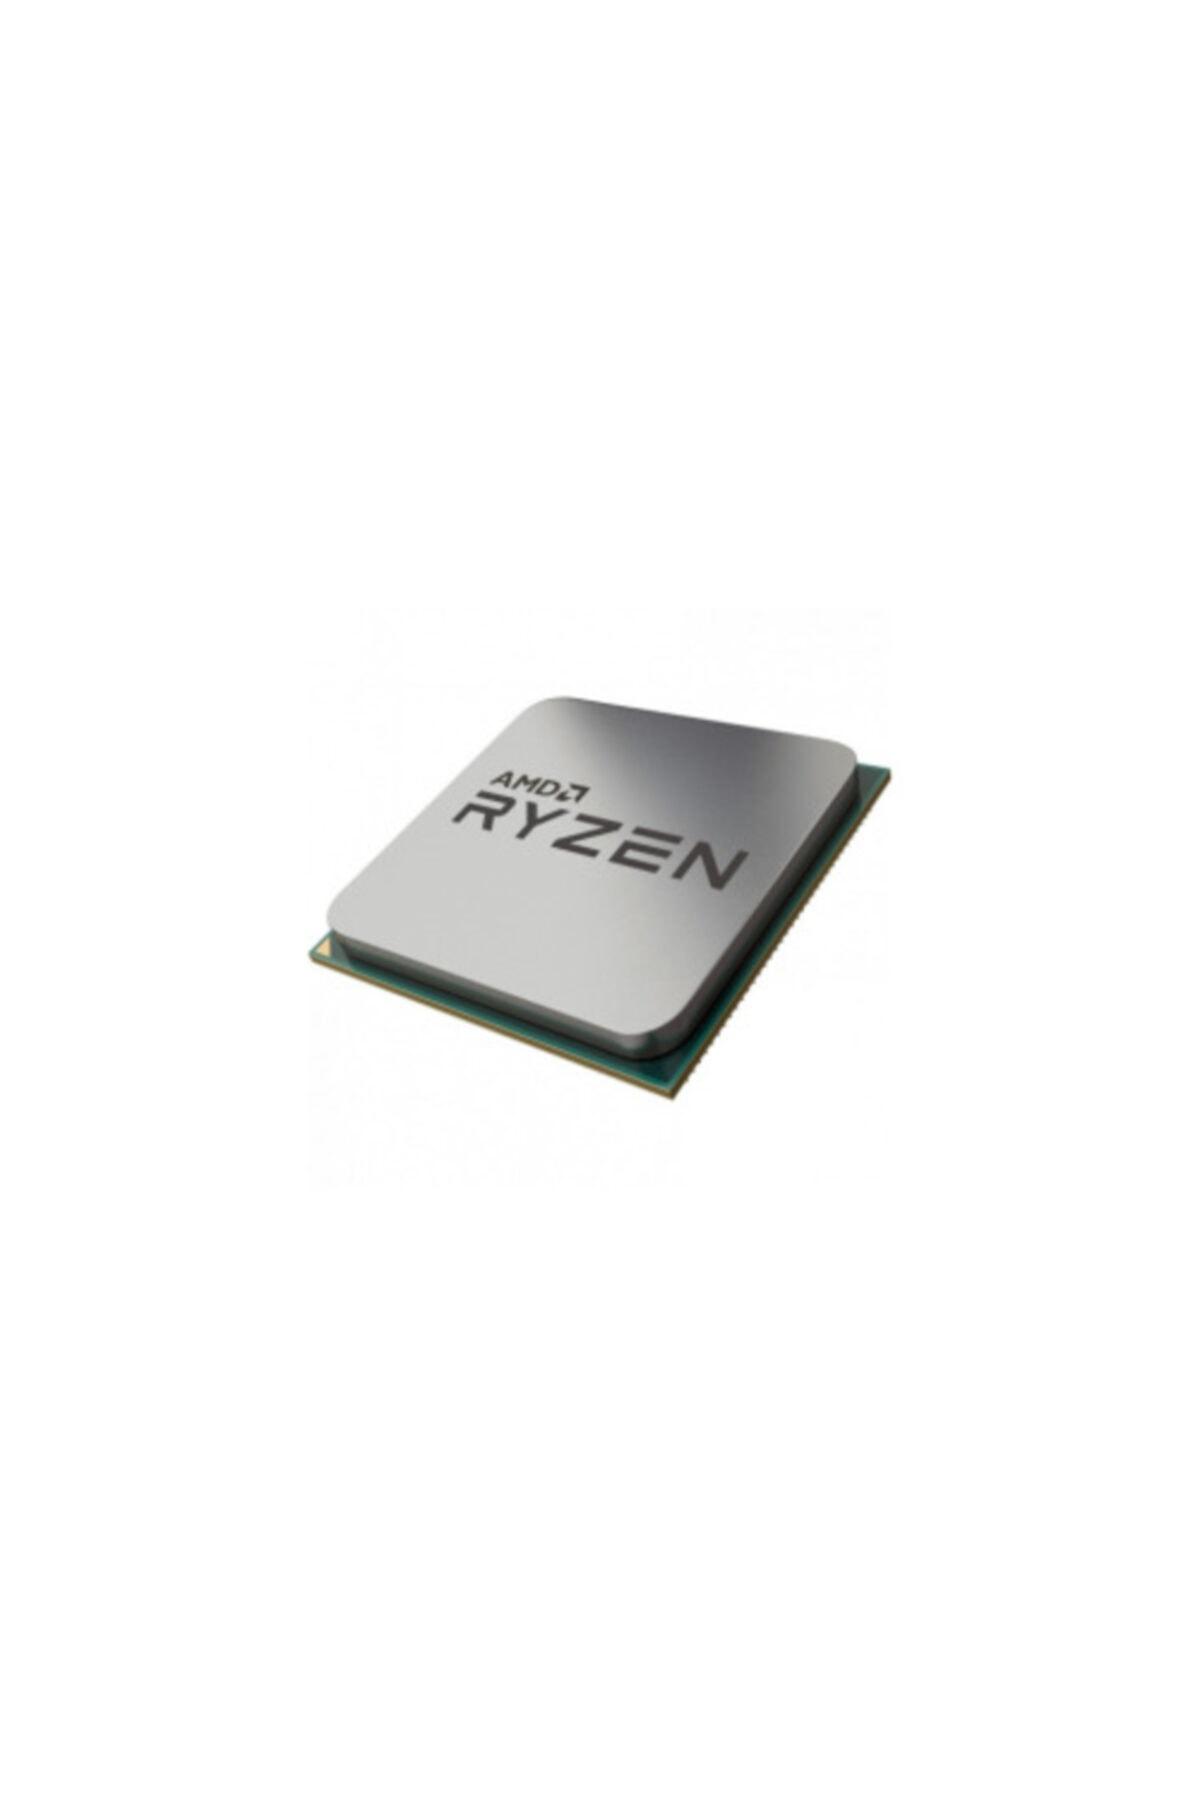 Amd Athlon 3000g 2 Core, 3,50ghz Radeon Vega3 Fan Yok Am4 Tray 1